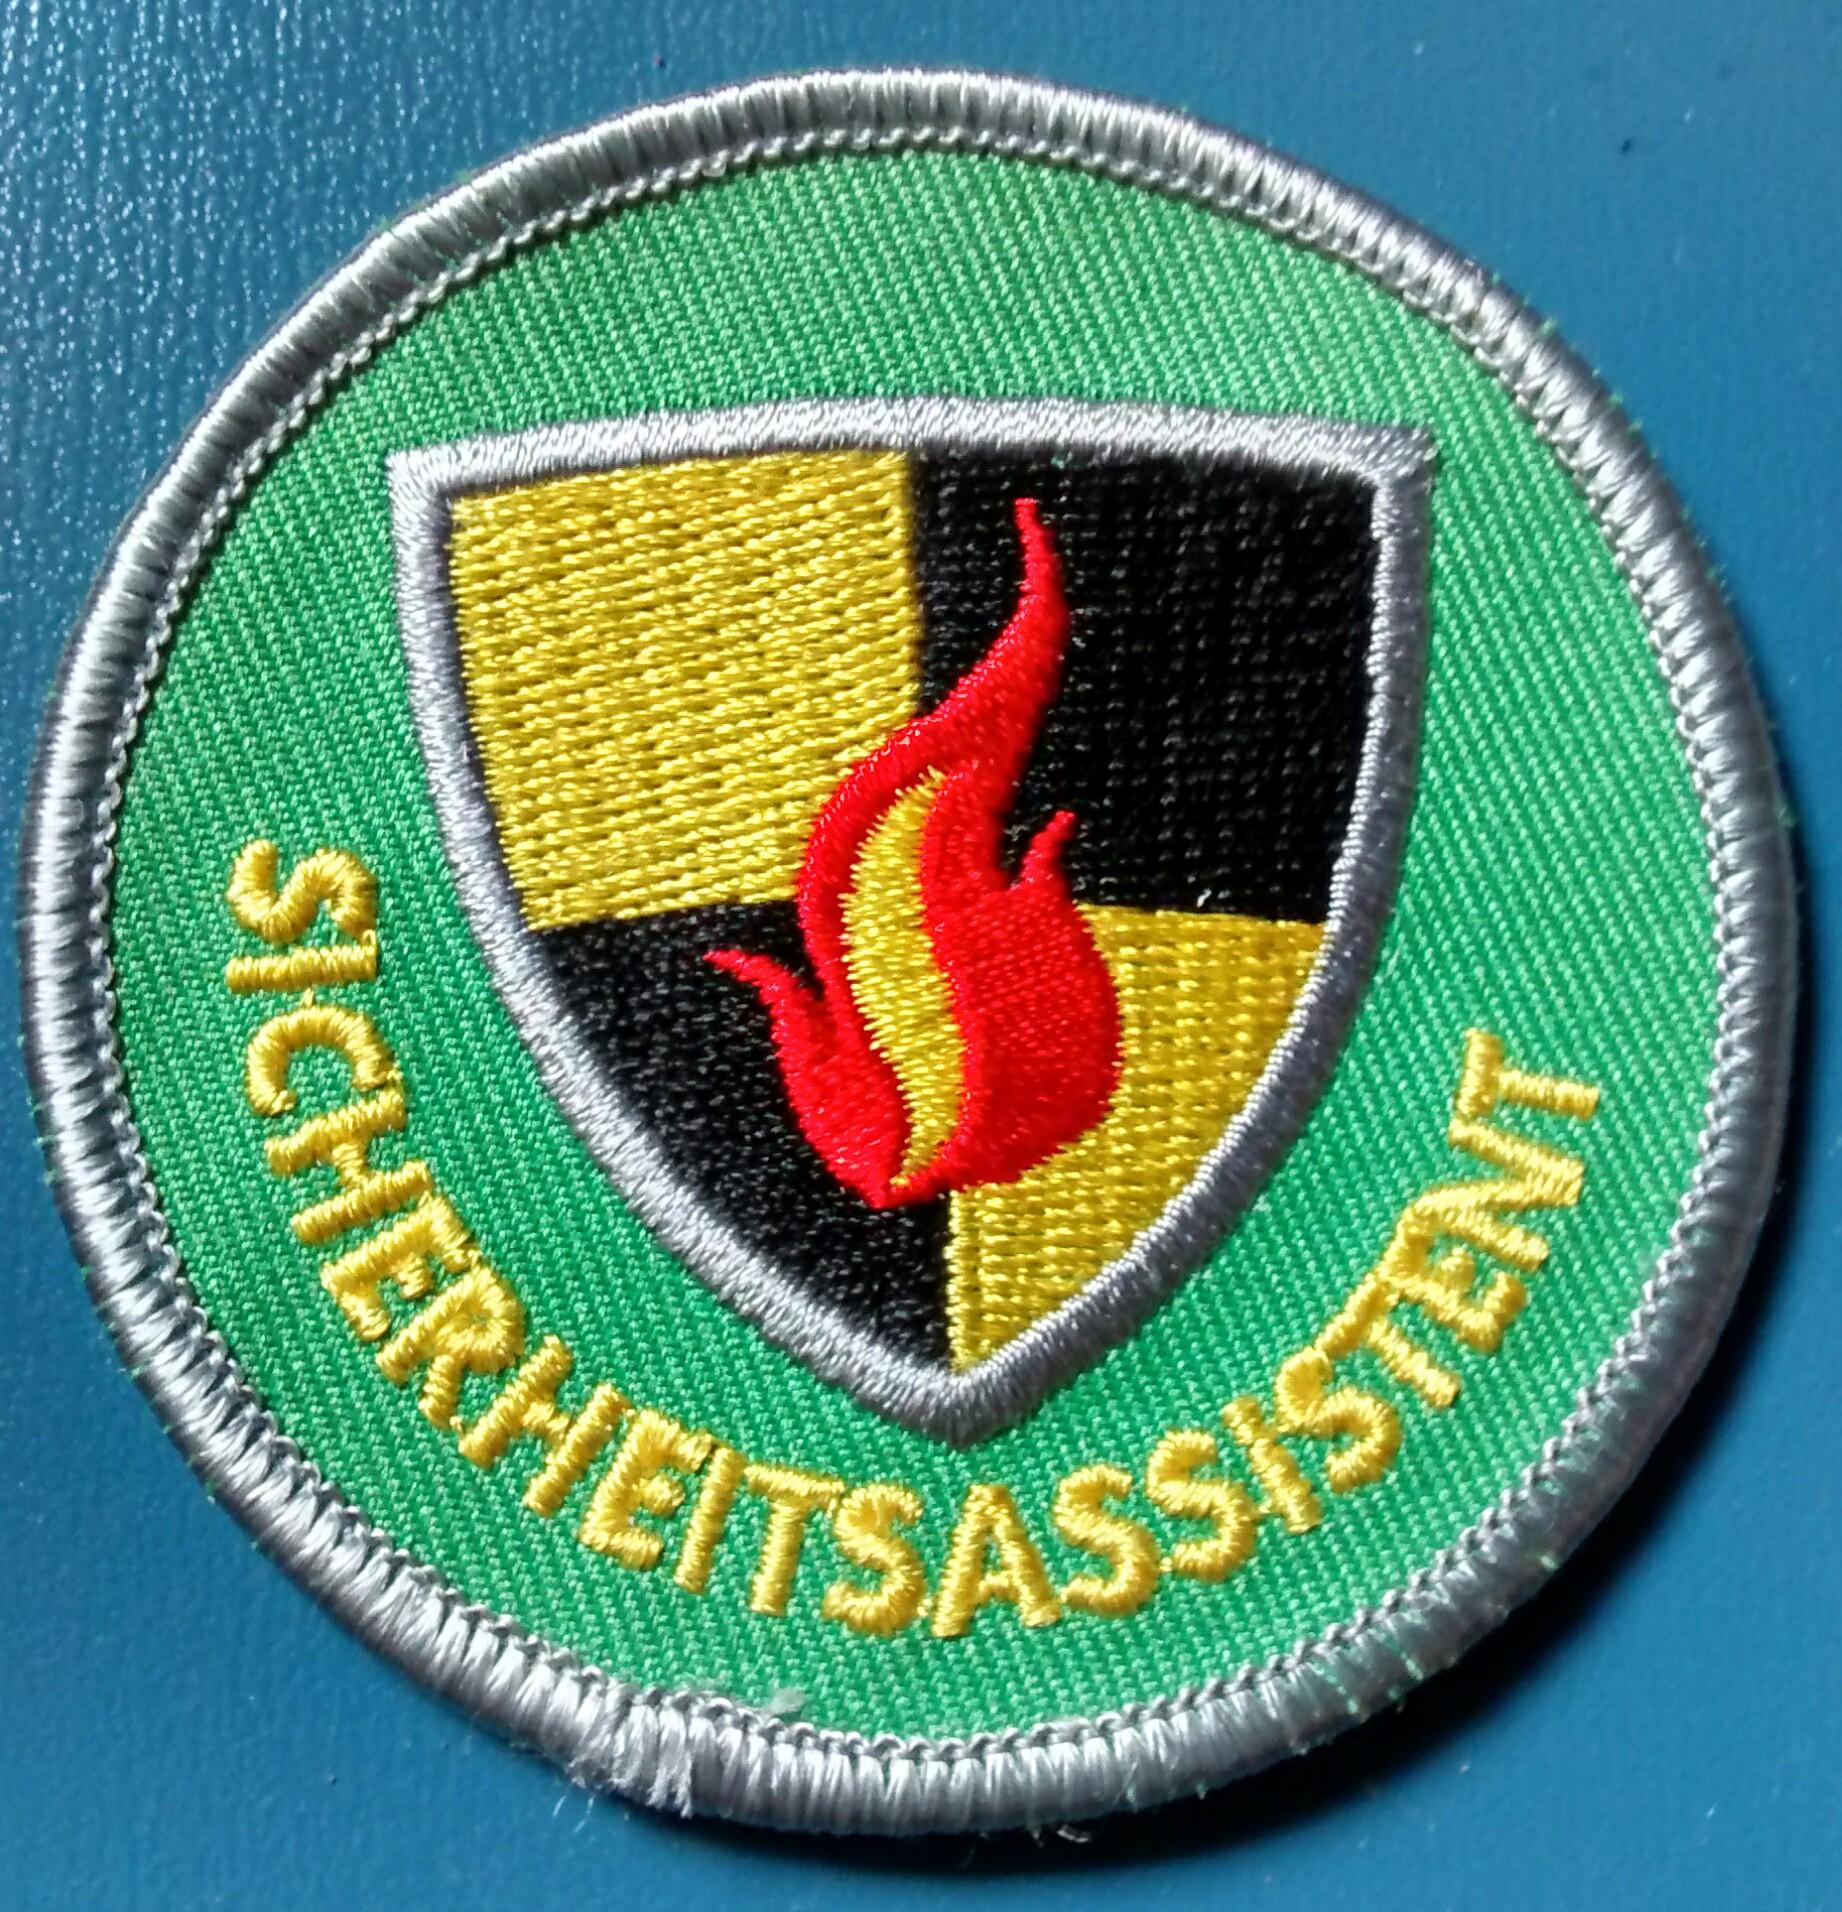 Sicherheitsassisent (SiAss)